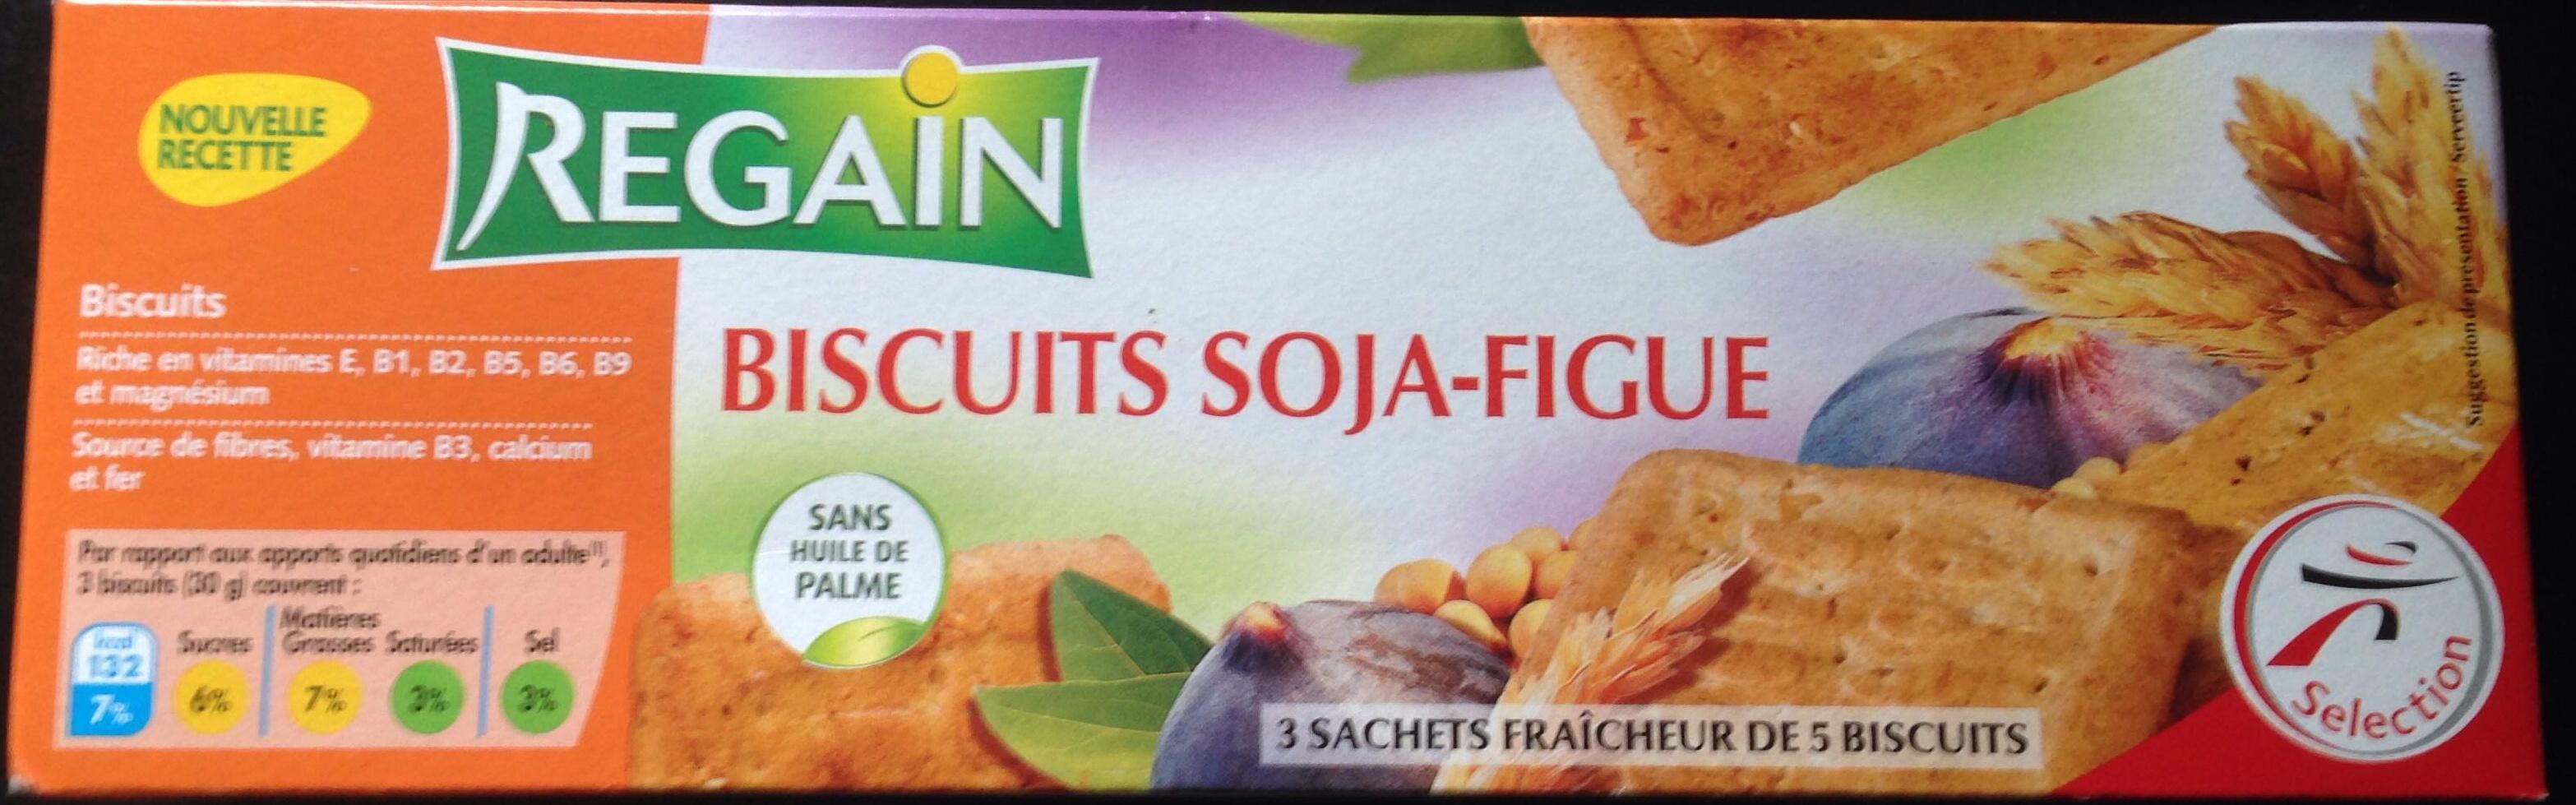 Biscuit soja figue - Product - fr